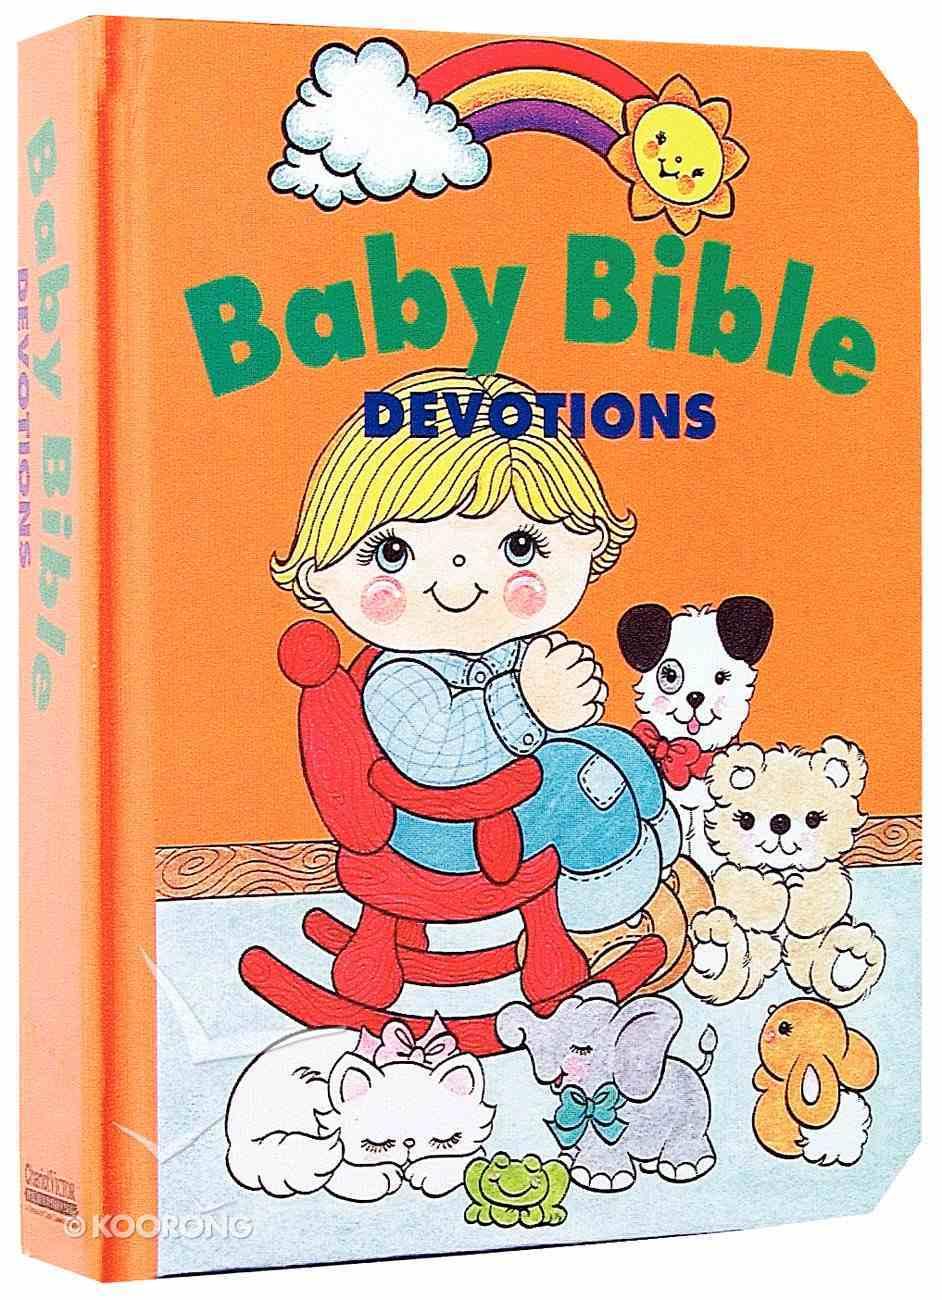 Devotions (Baby Bible Series) Hardback